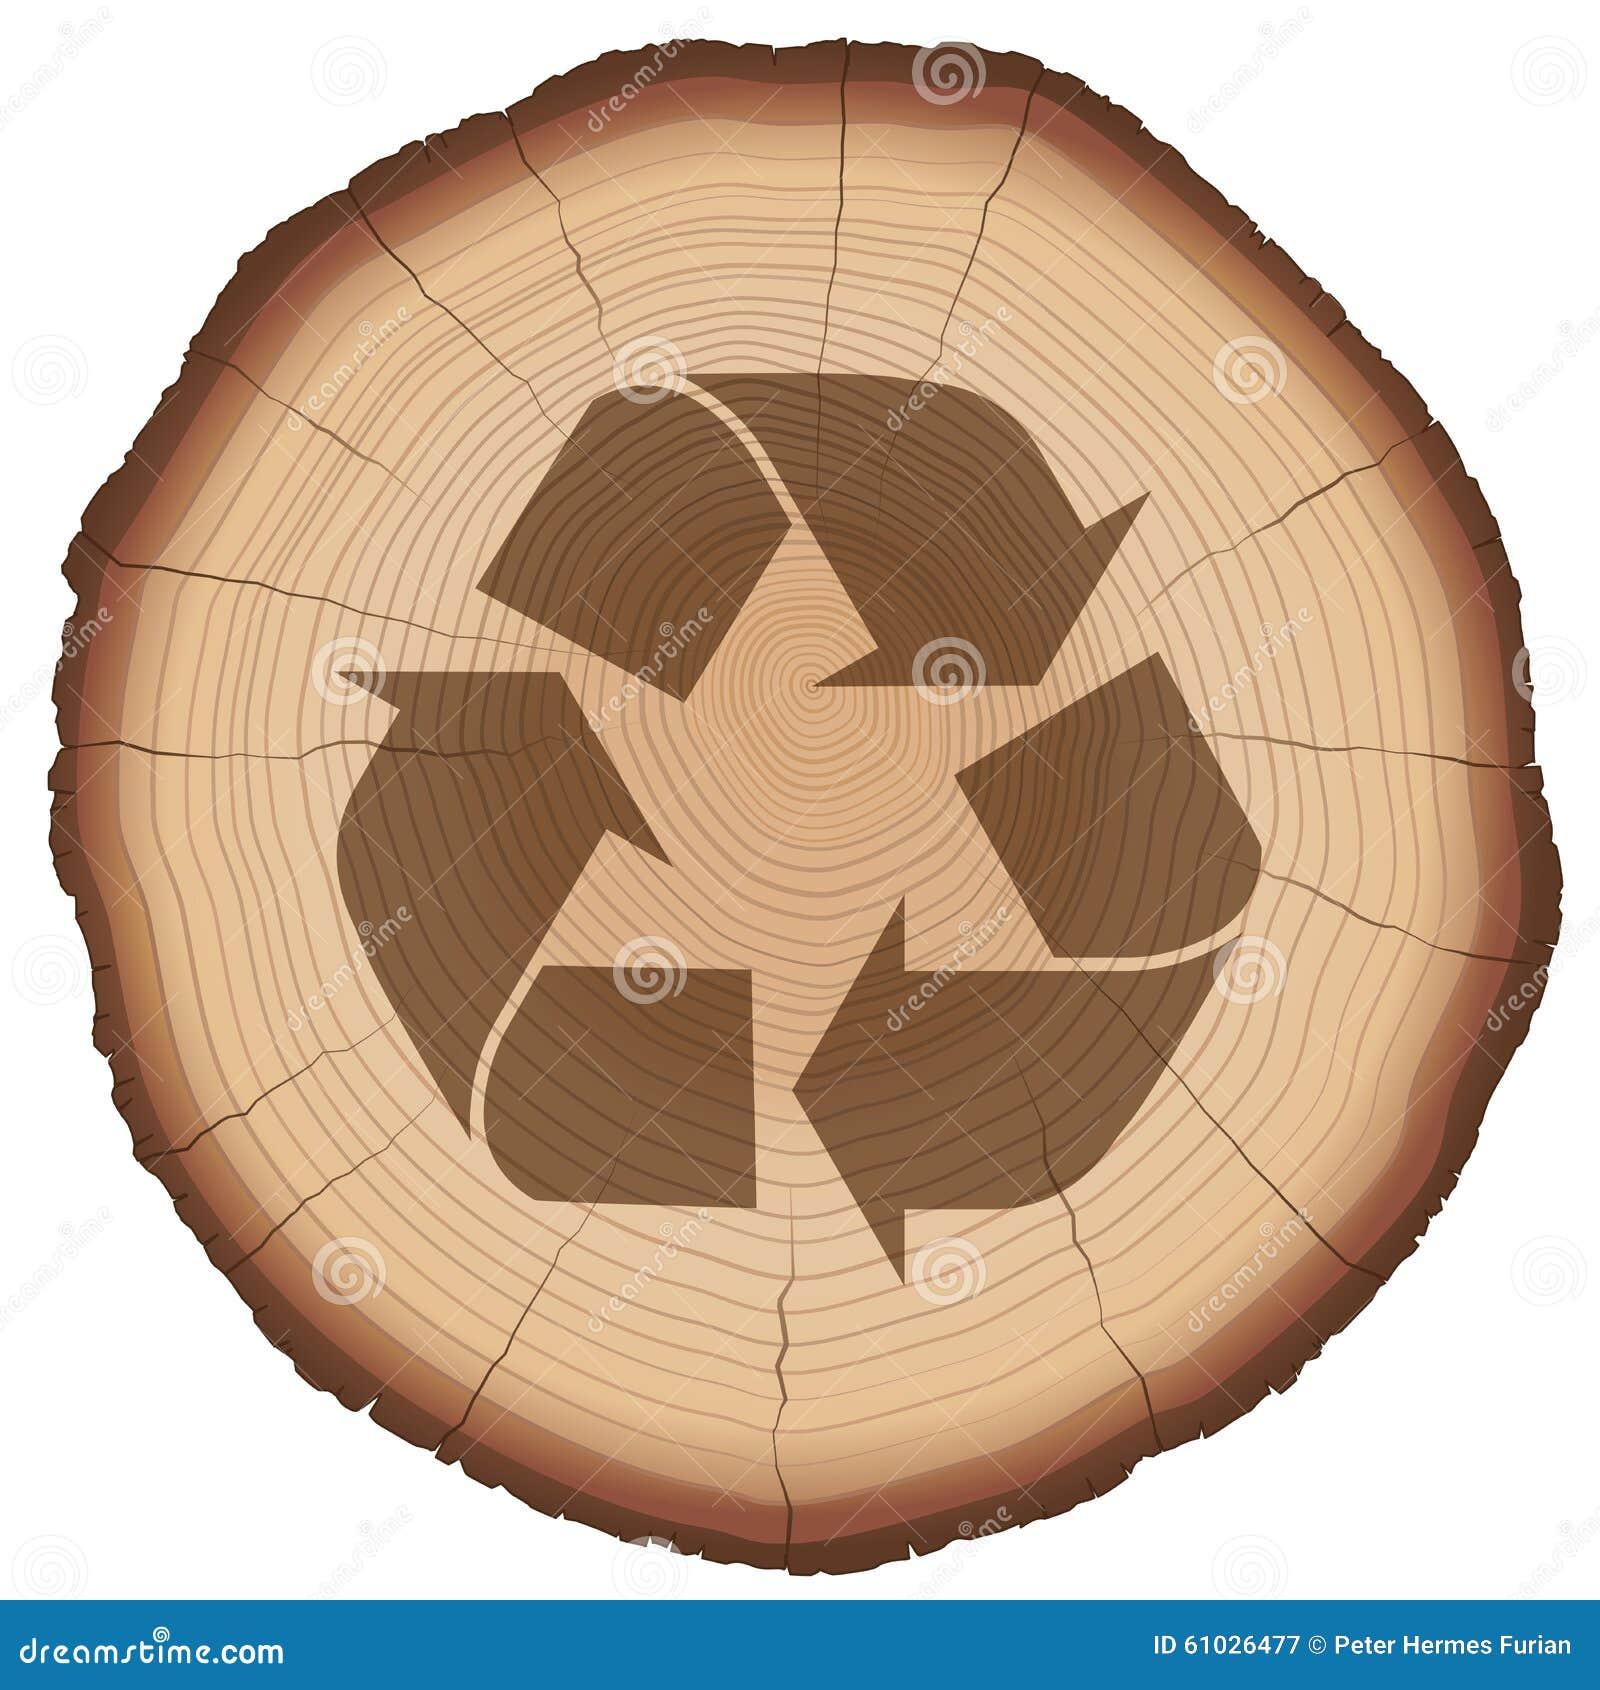 Wood recycling symbol tree trunk editorial photography for Imagenes de reciclaje de madera